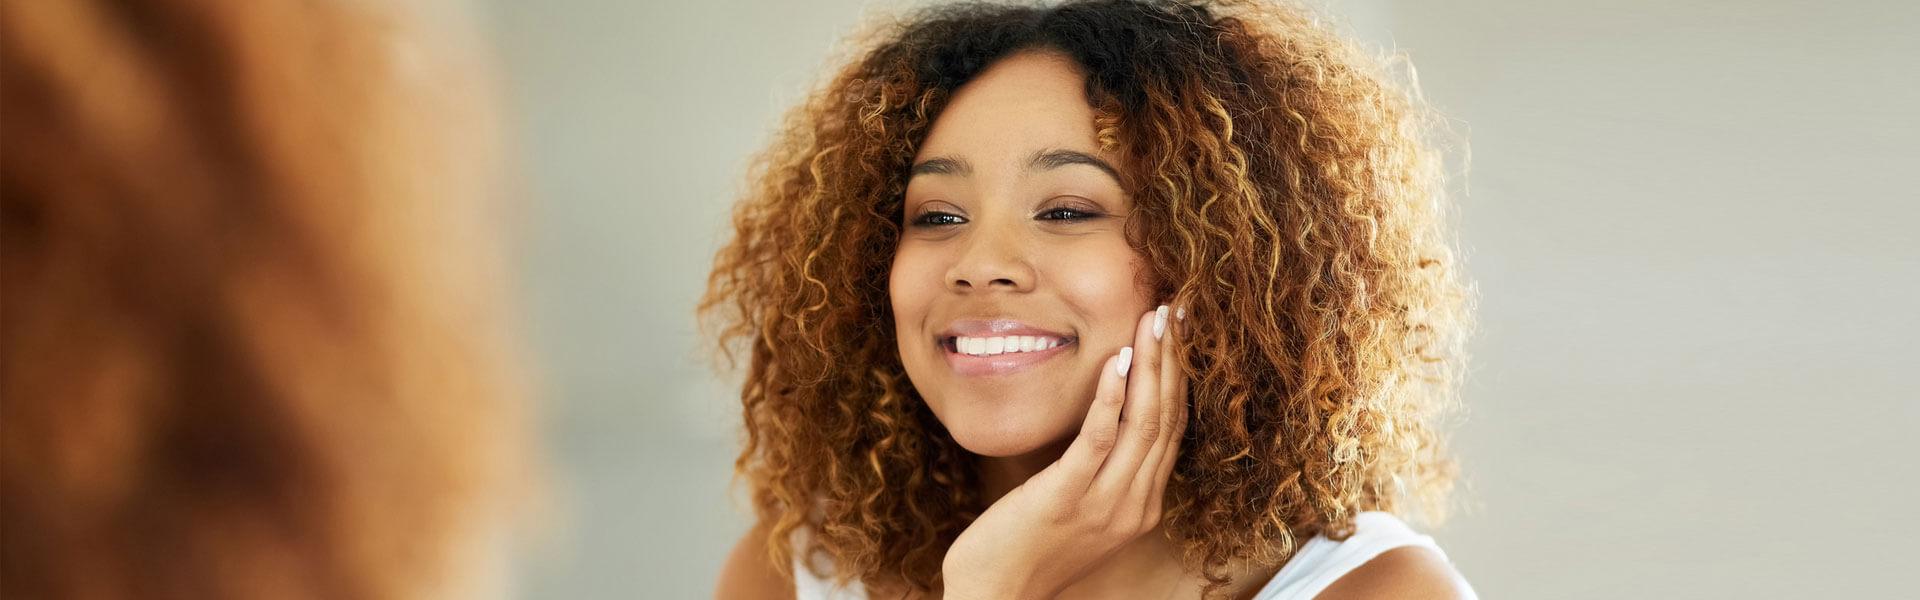 laser dental treatment